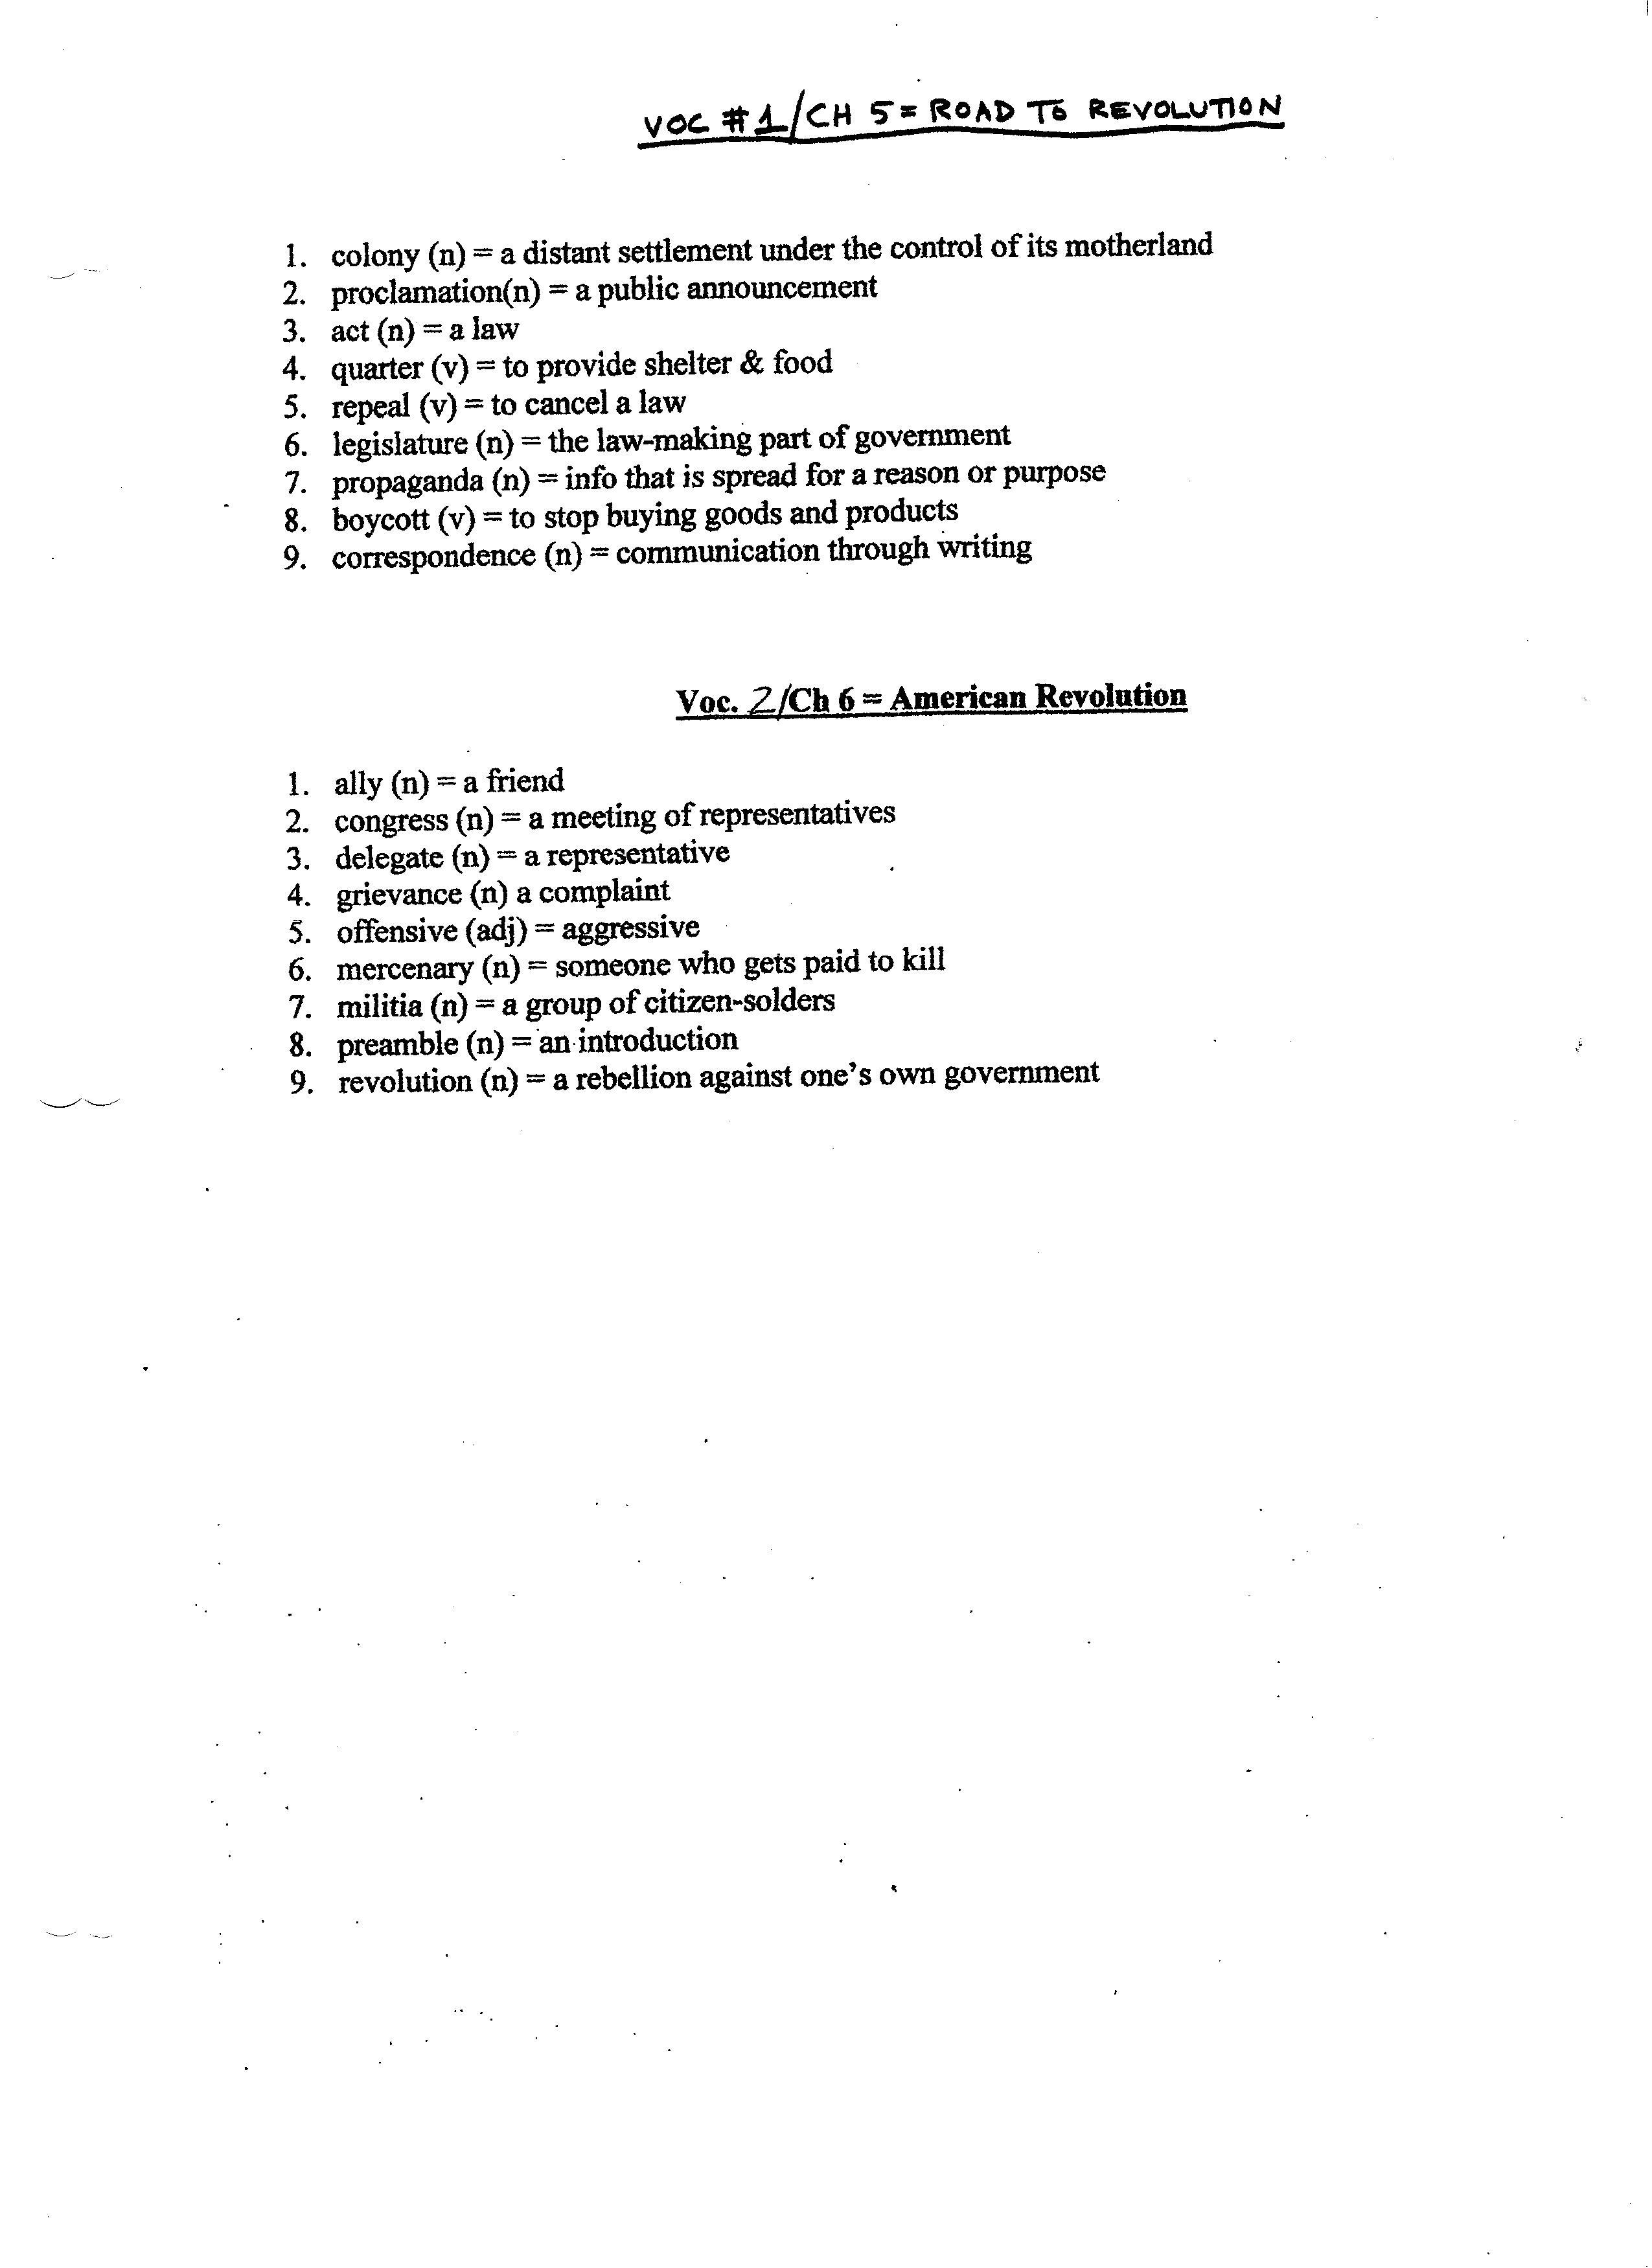 Obregon Jose Homework